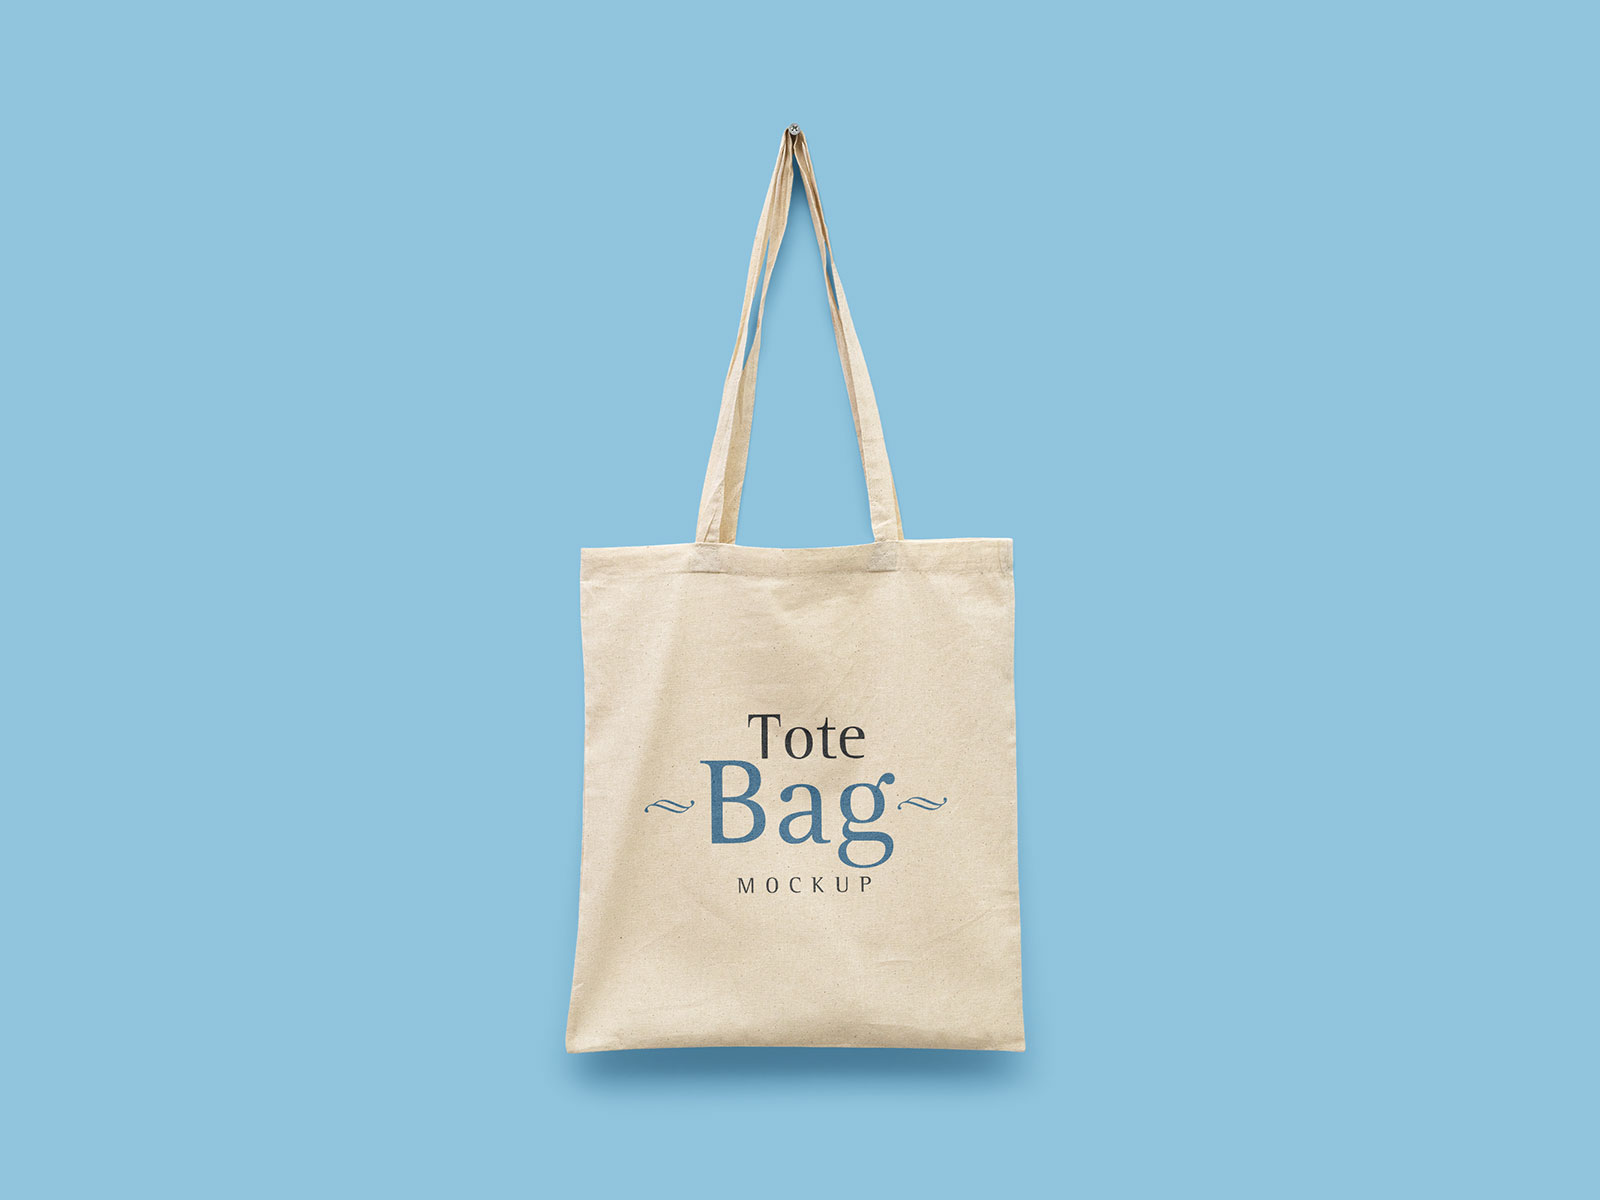 Free-Hanging-Tote-Bag-Mockup-PSD